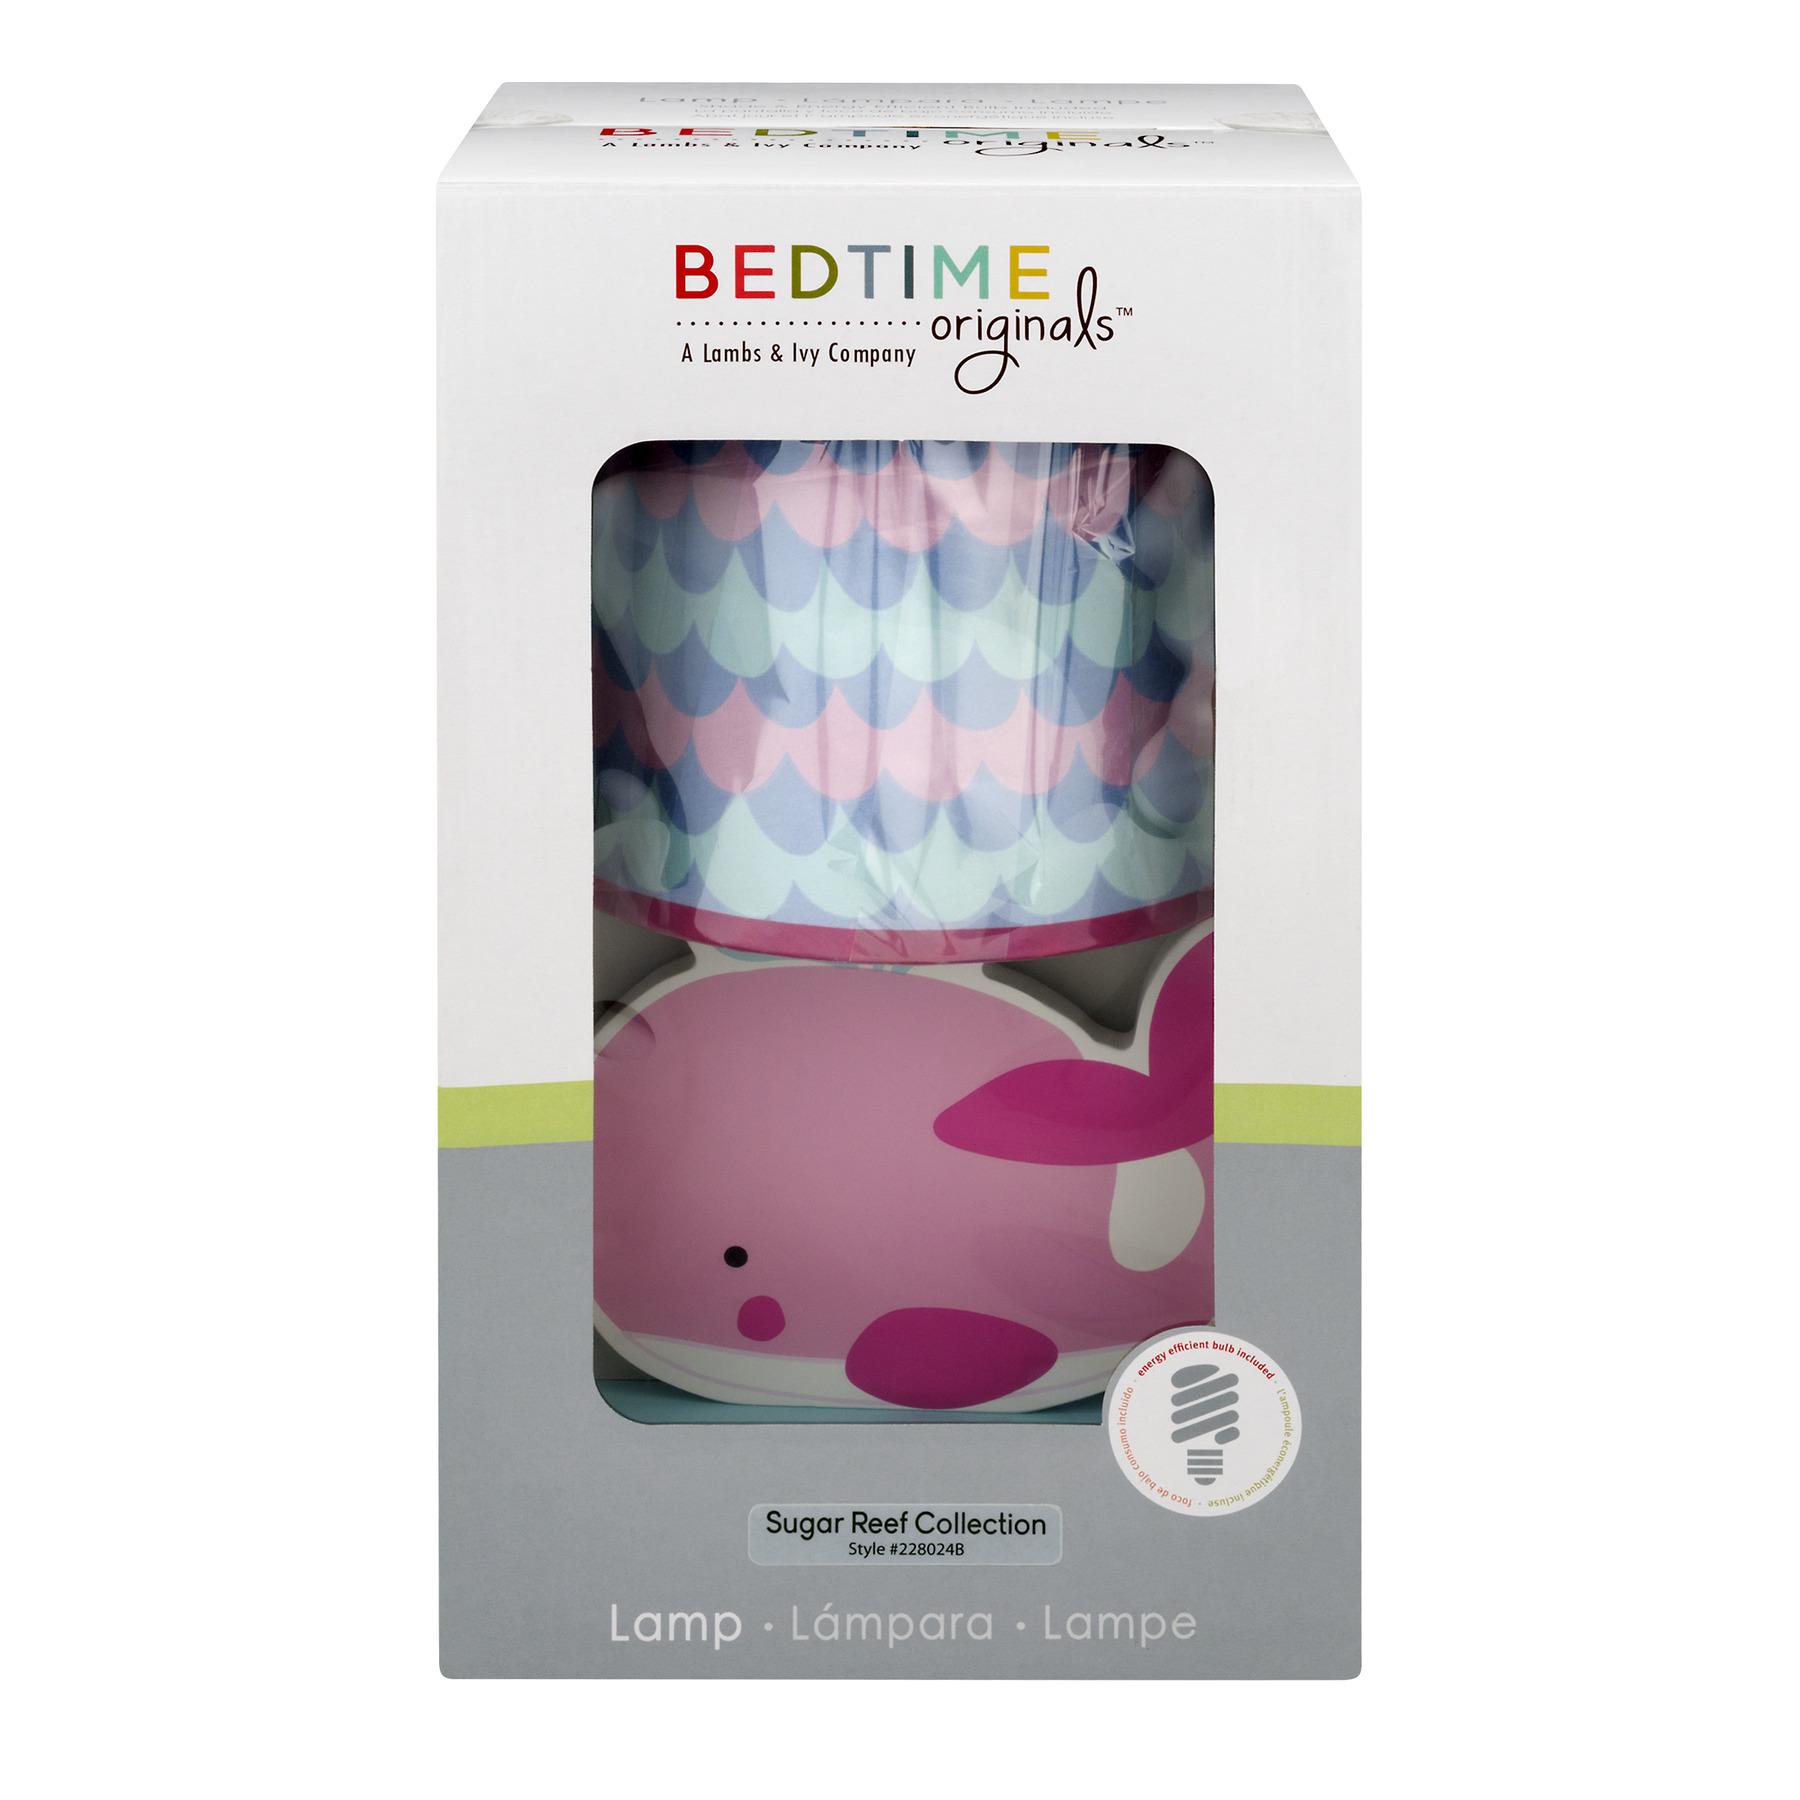 Bedtime Originals Lamp Sugar Reef Collection - 1 CT1.0 CT